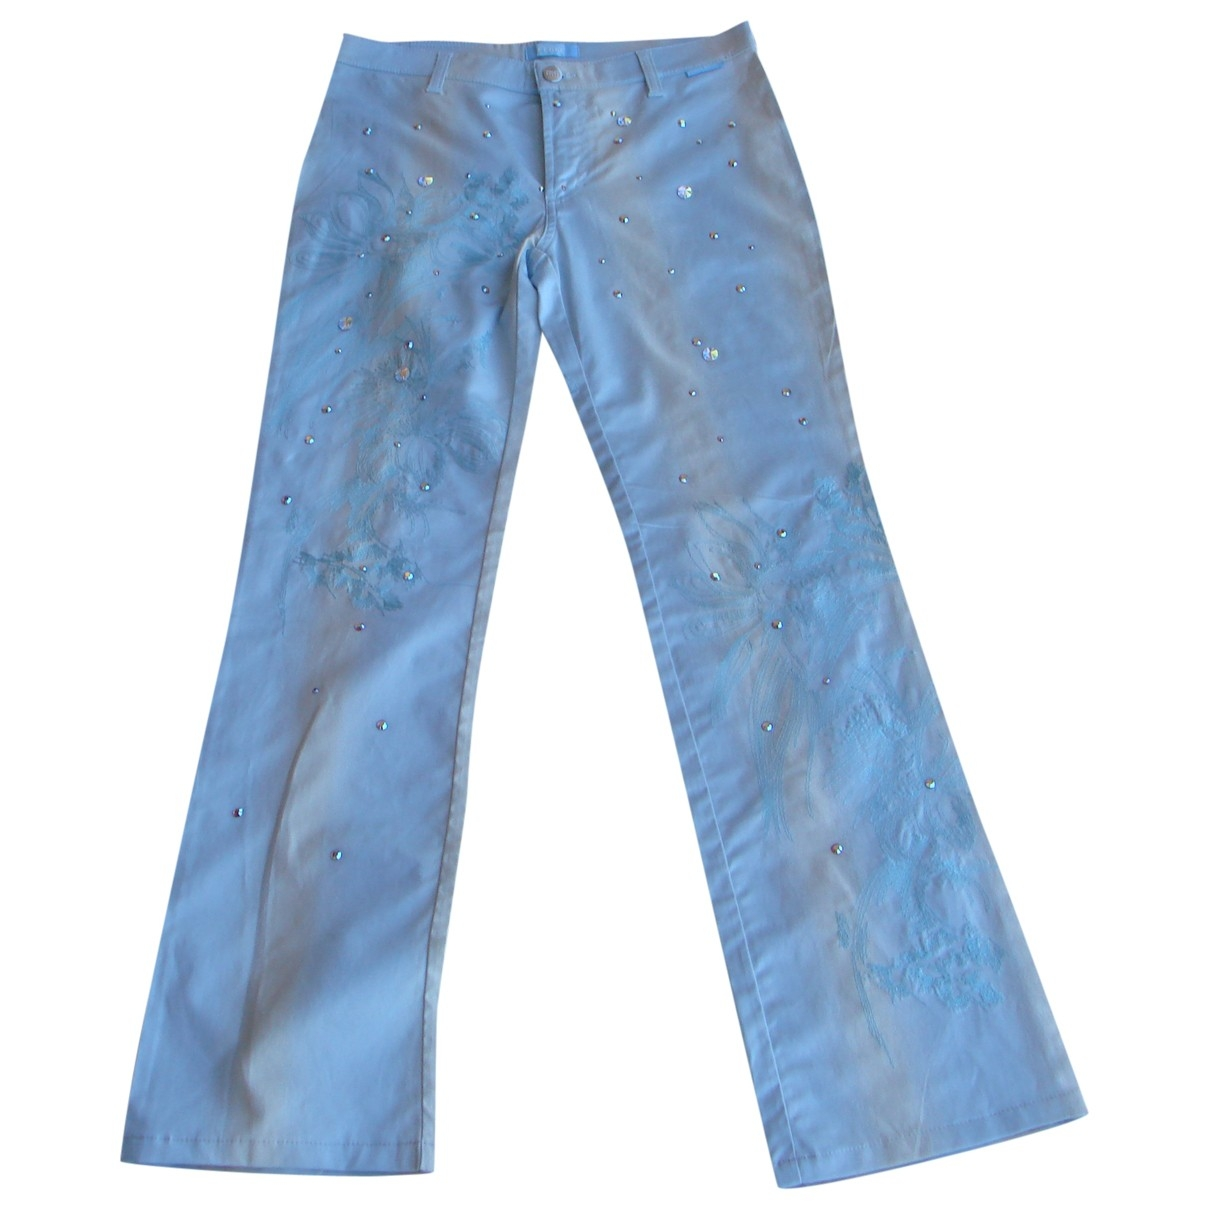 Gianfranco Ferré \N Blue Cotton Trousers for Women 38 FR